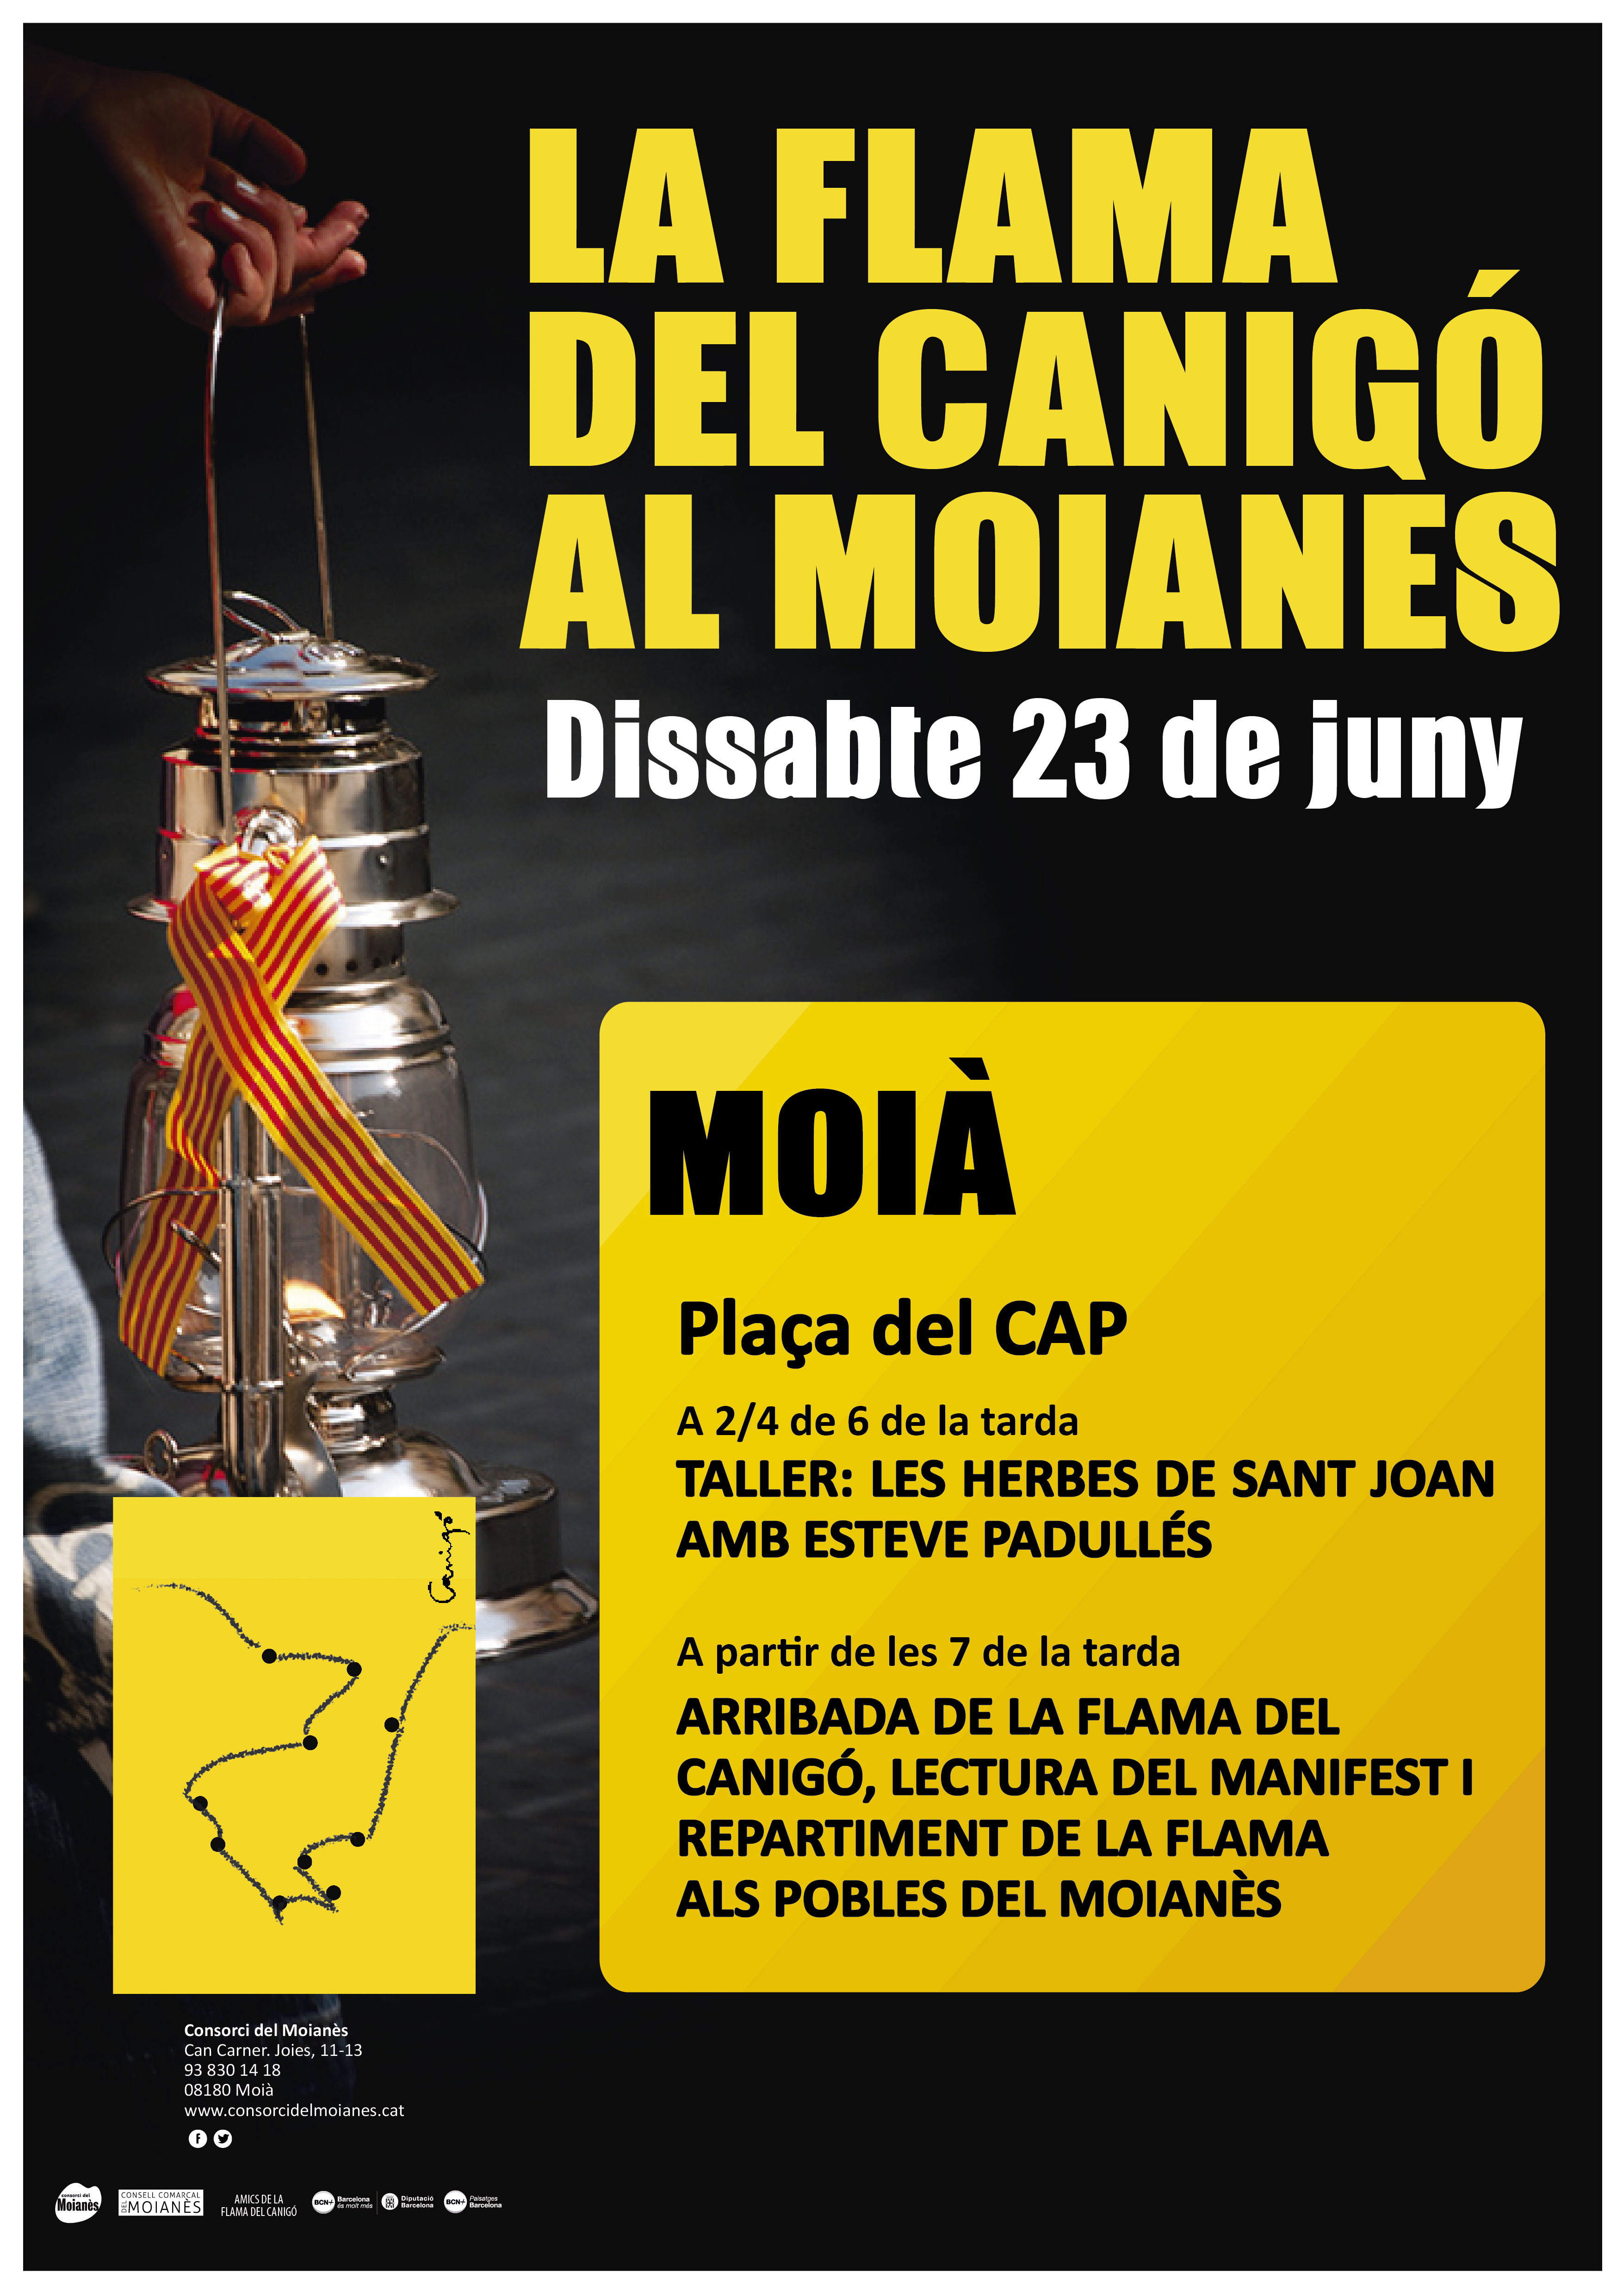 FLAMA CANIGO moia 2018-01